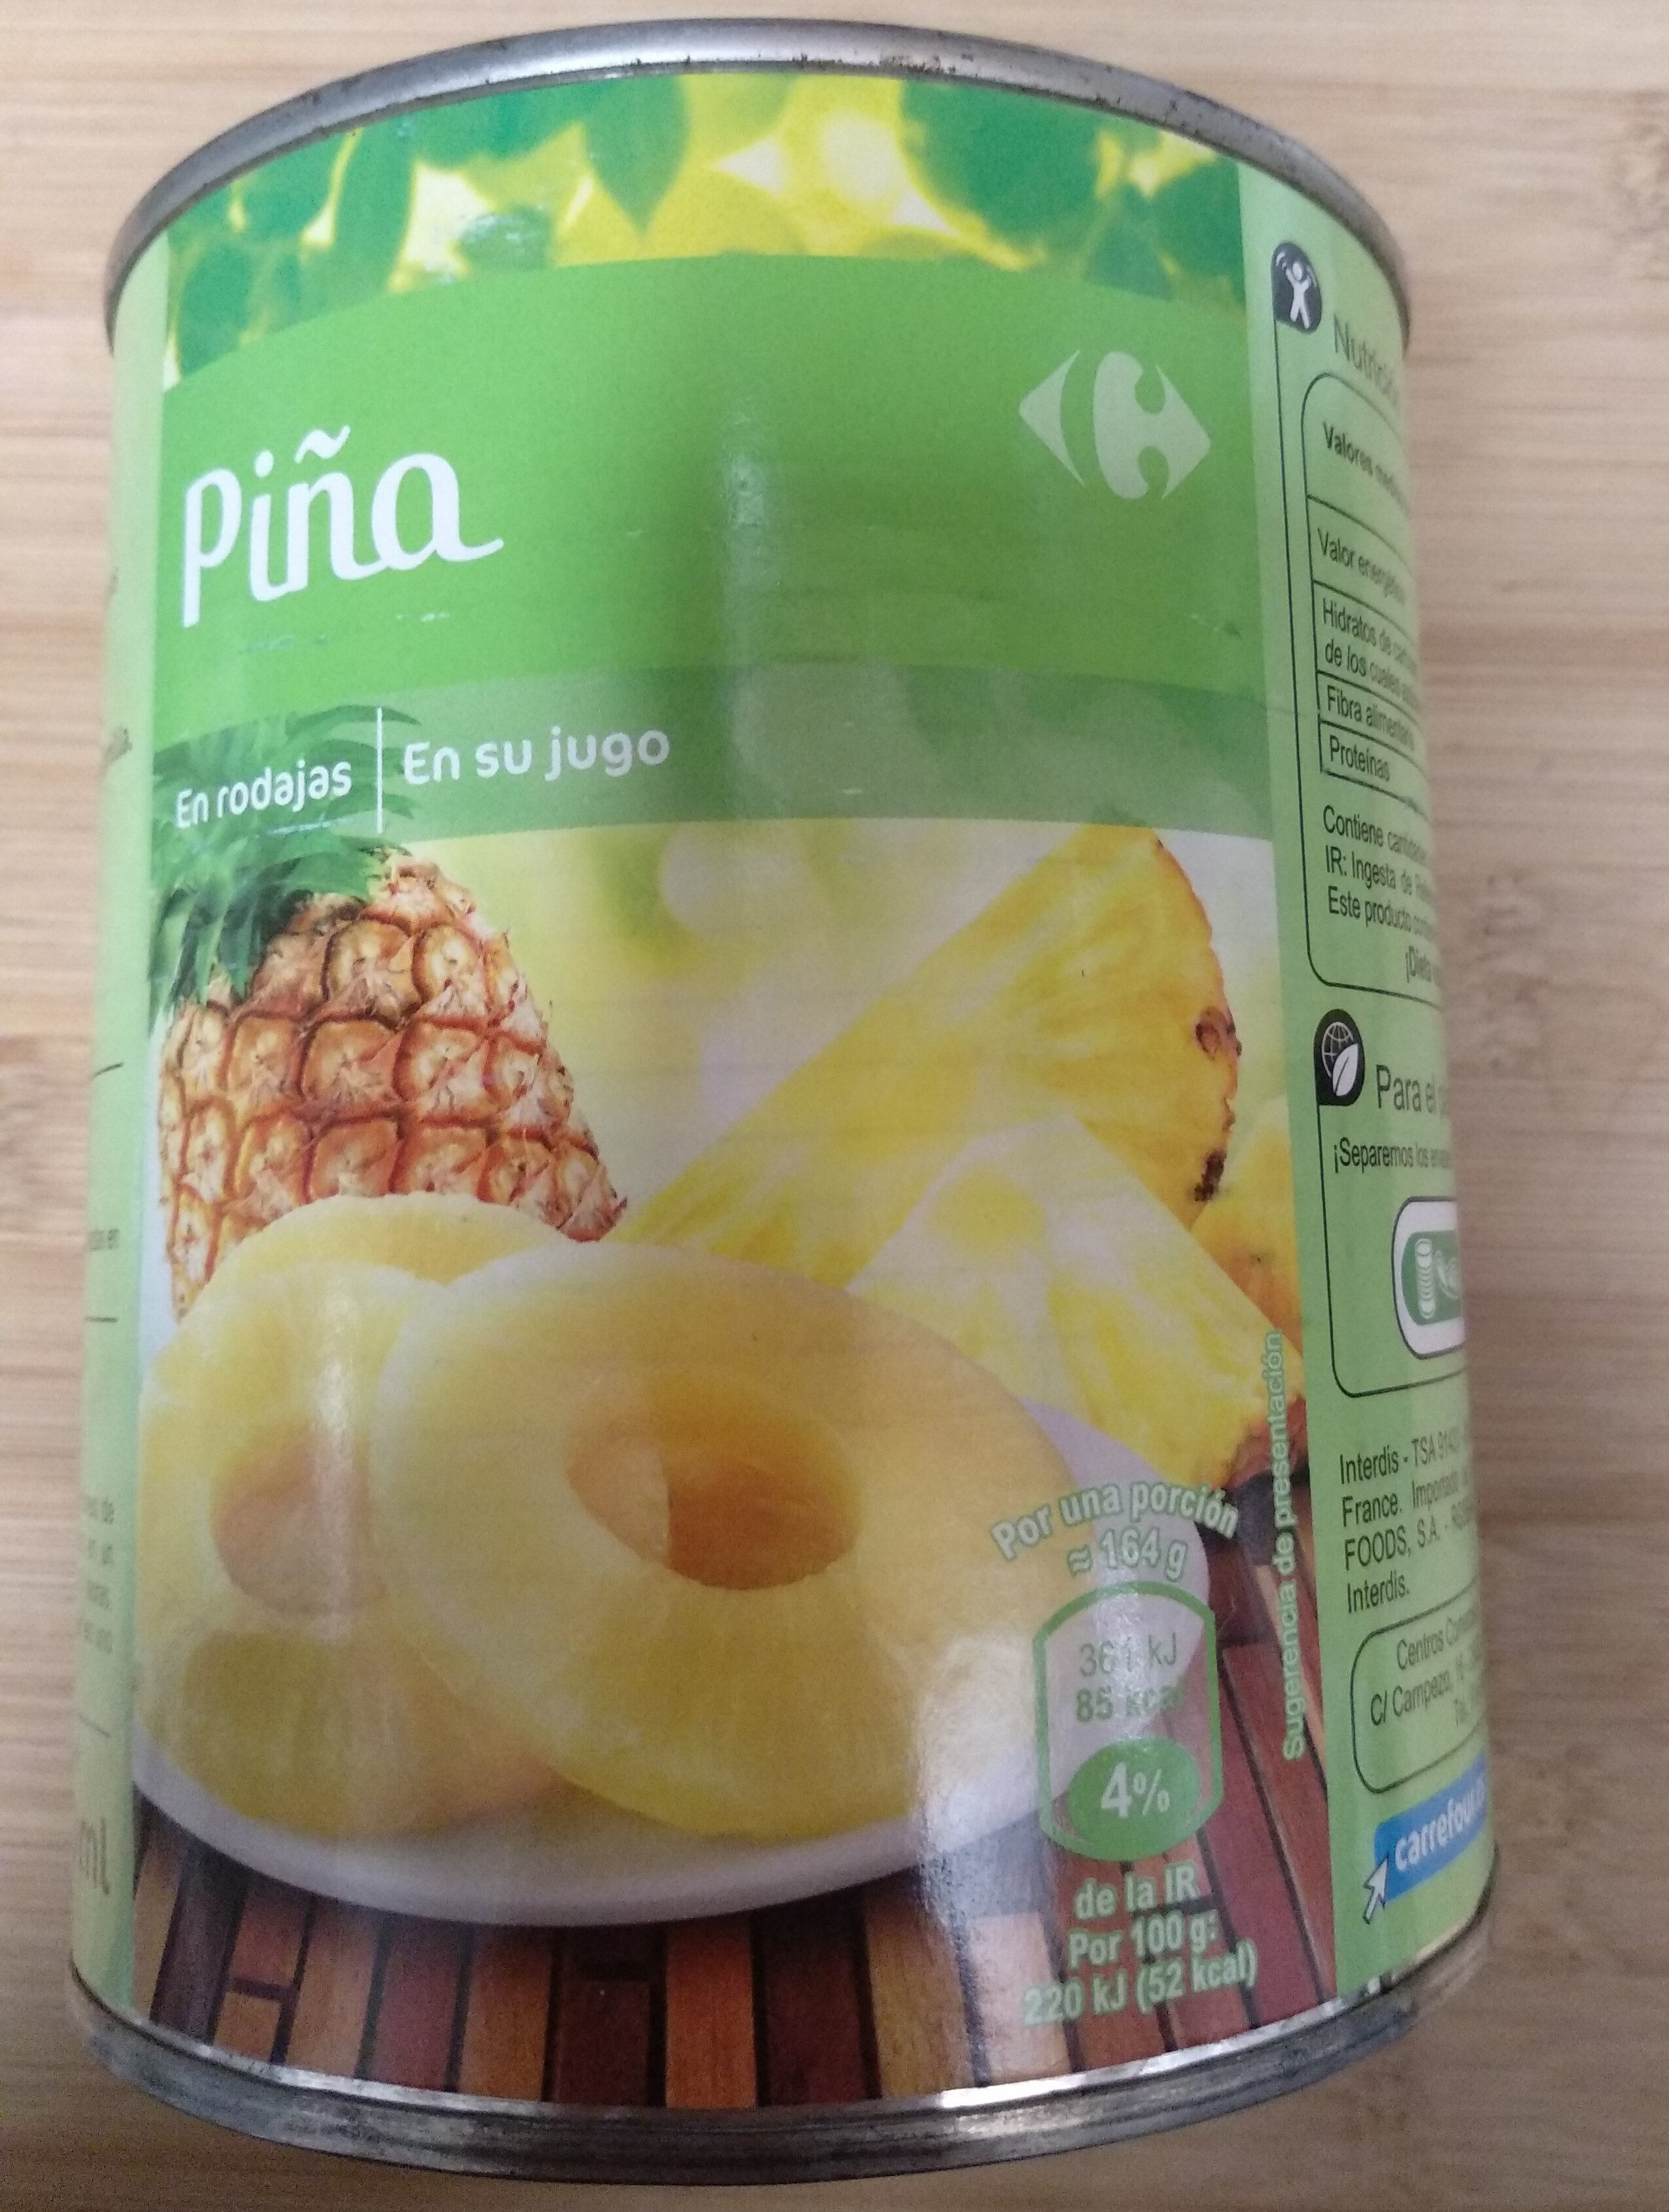 Piña - Producto